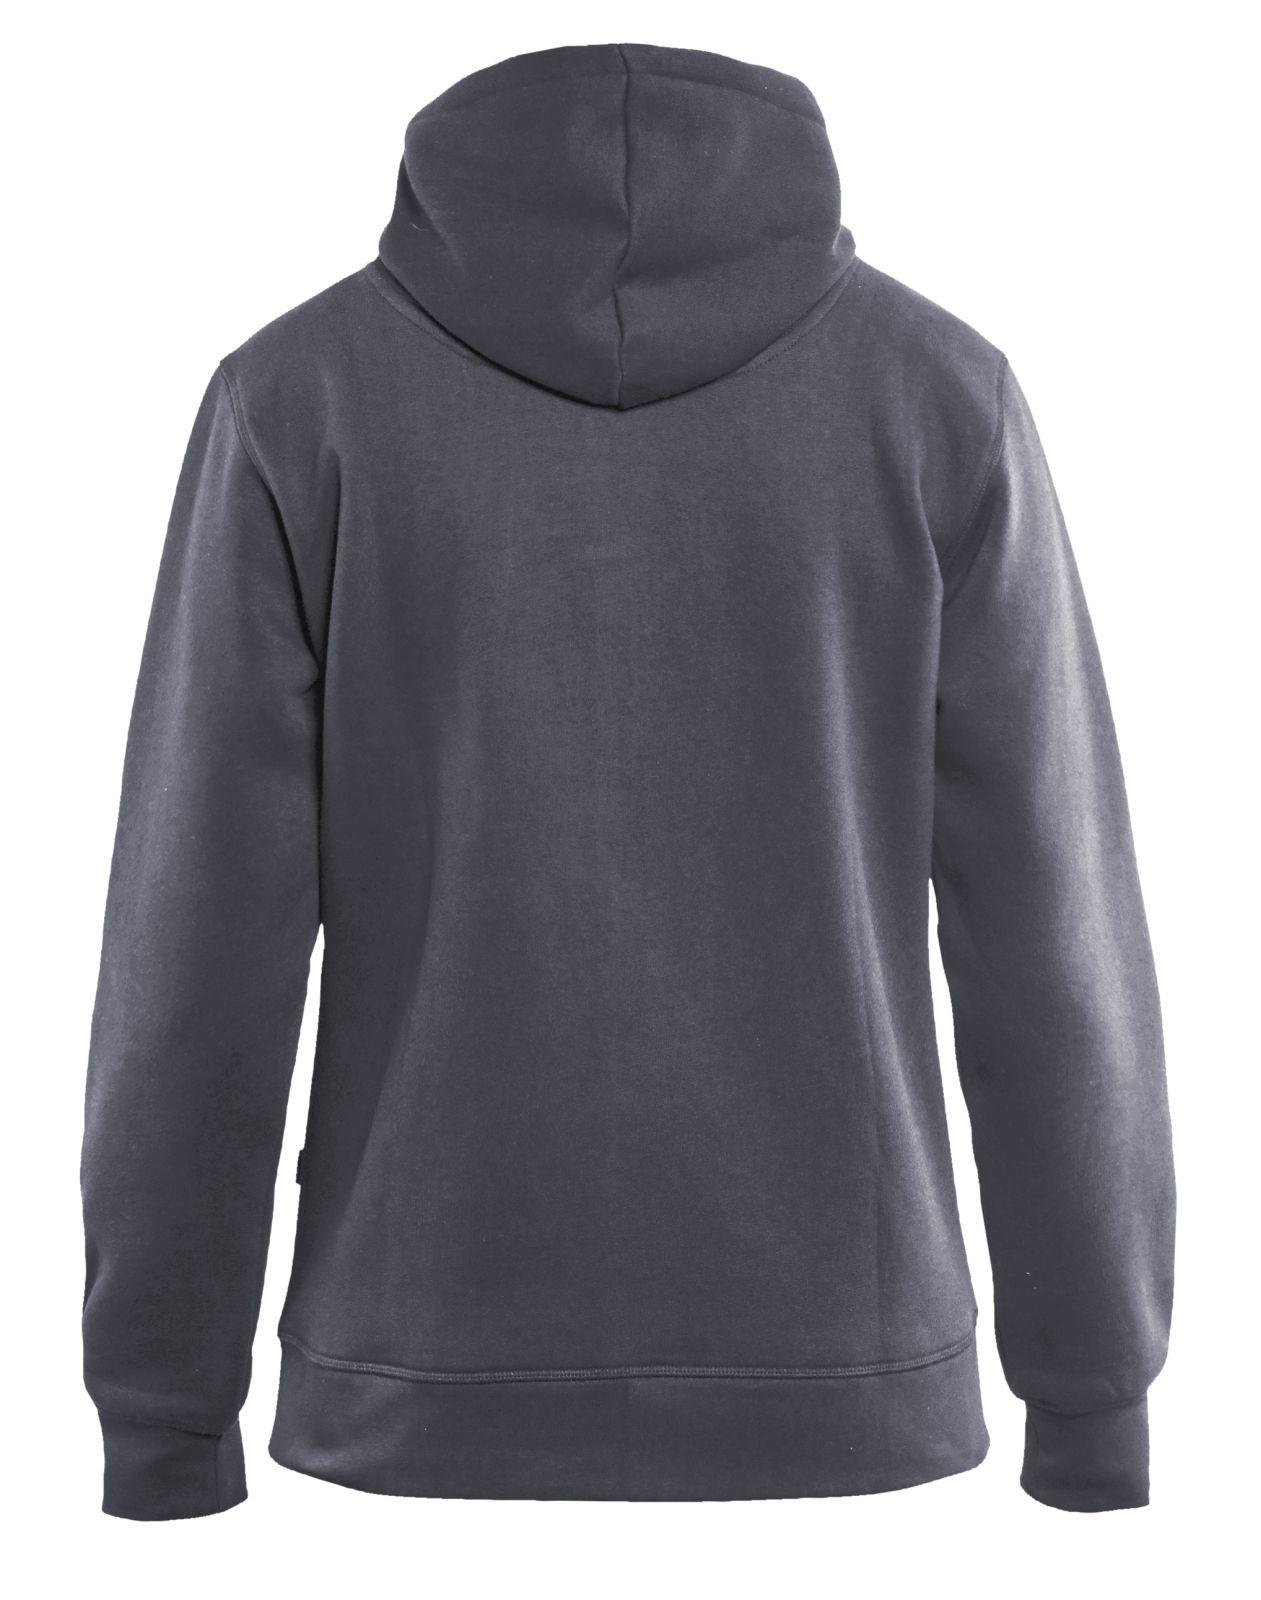 Blaklader Dames hooded sweatvesten 33951048 grijs(9400)